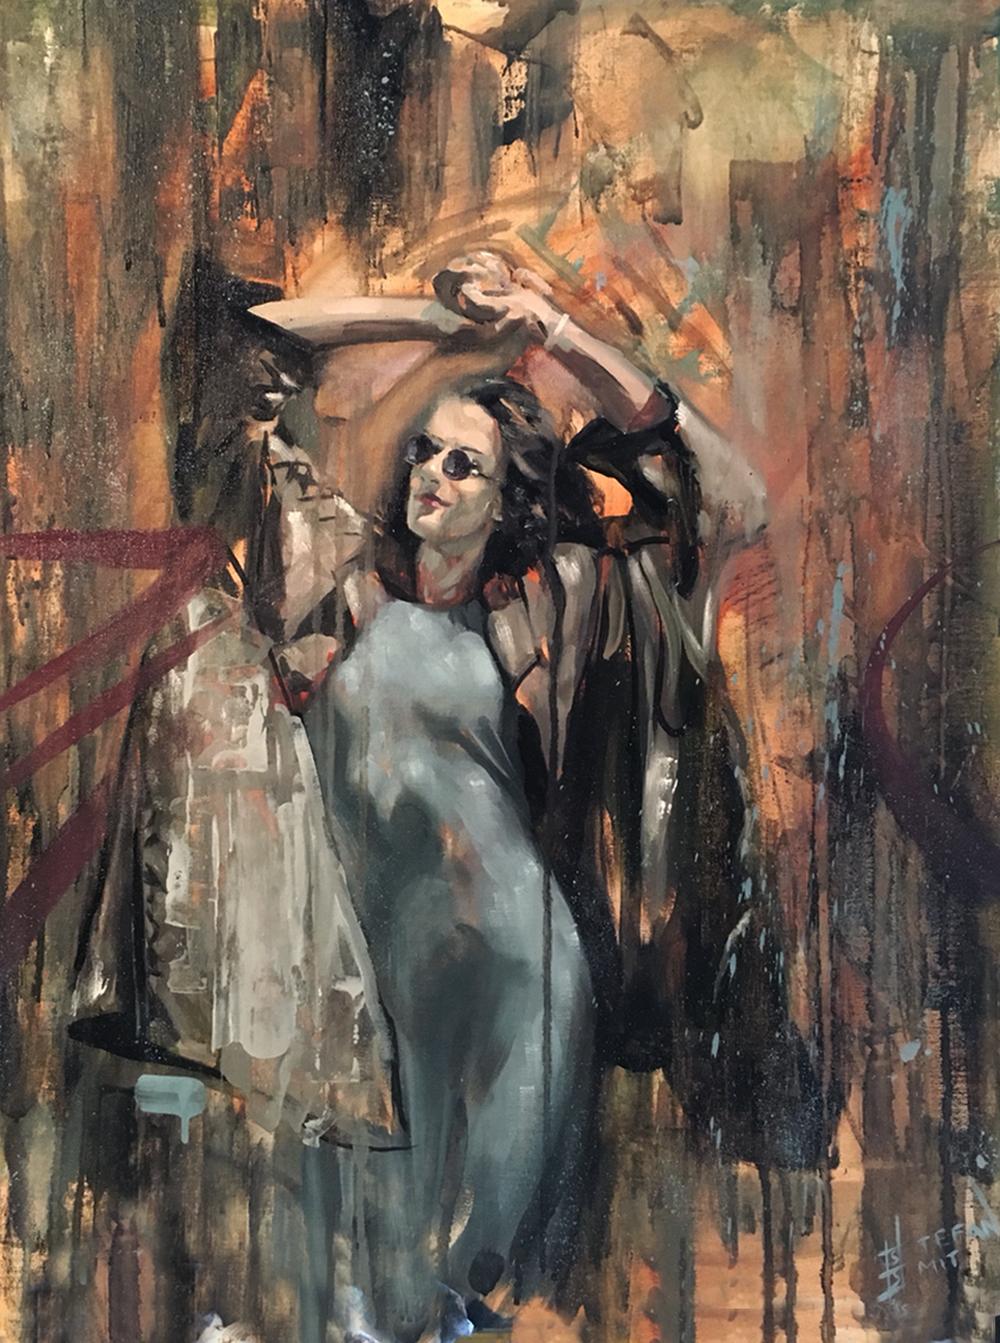 Stefan Smit  'Endearment Everlasting'  Oil on canvas  71 x 56 cm